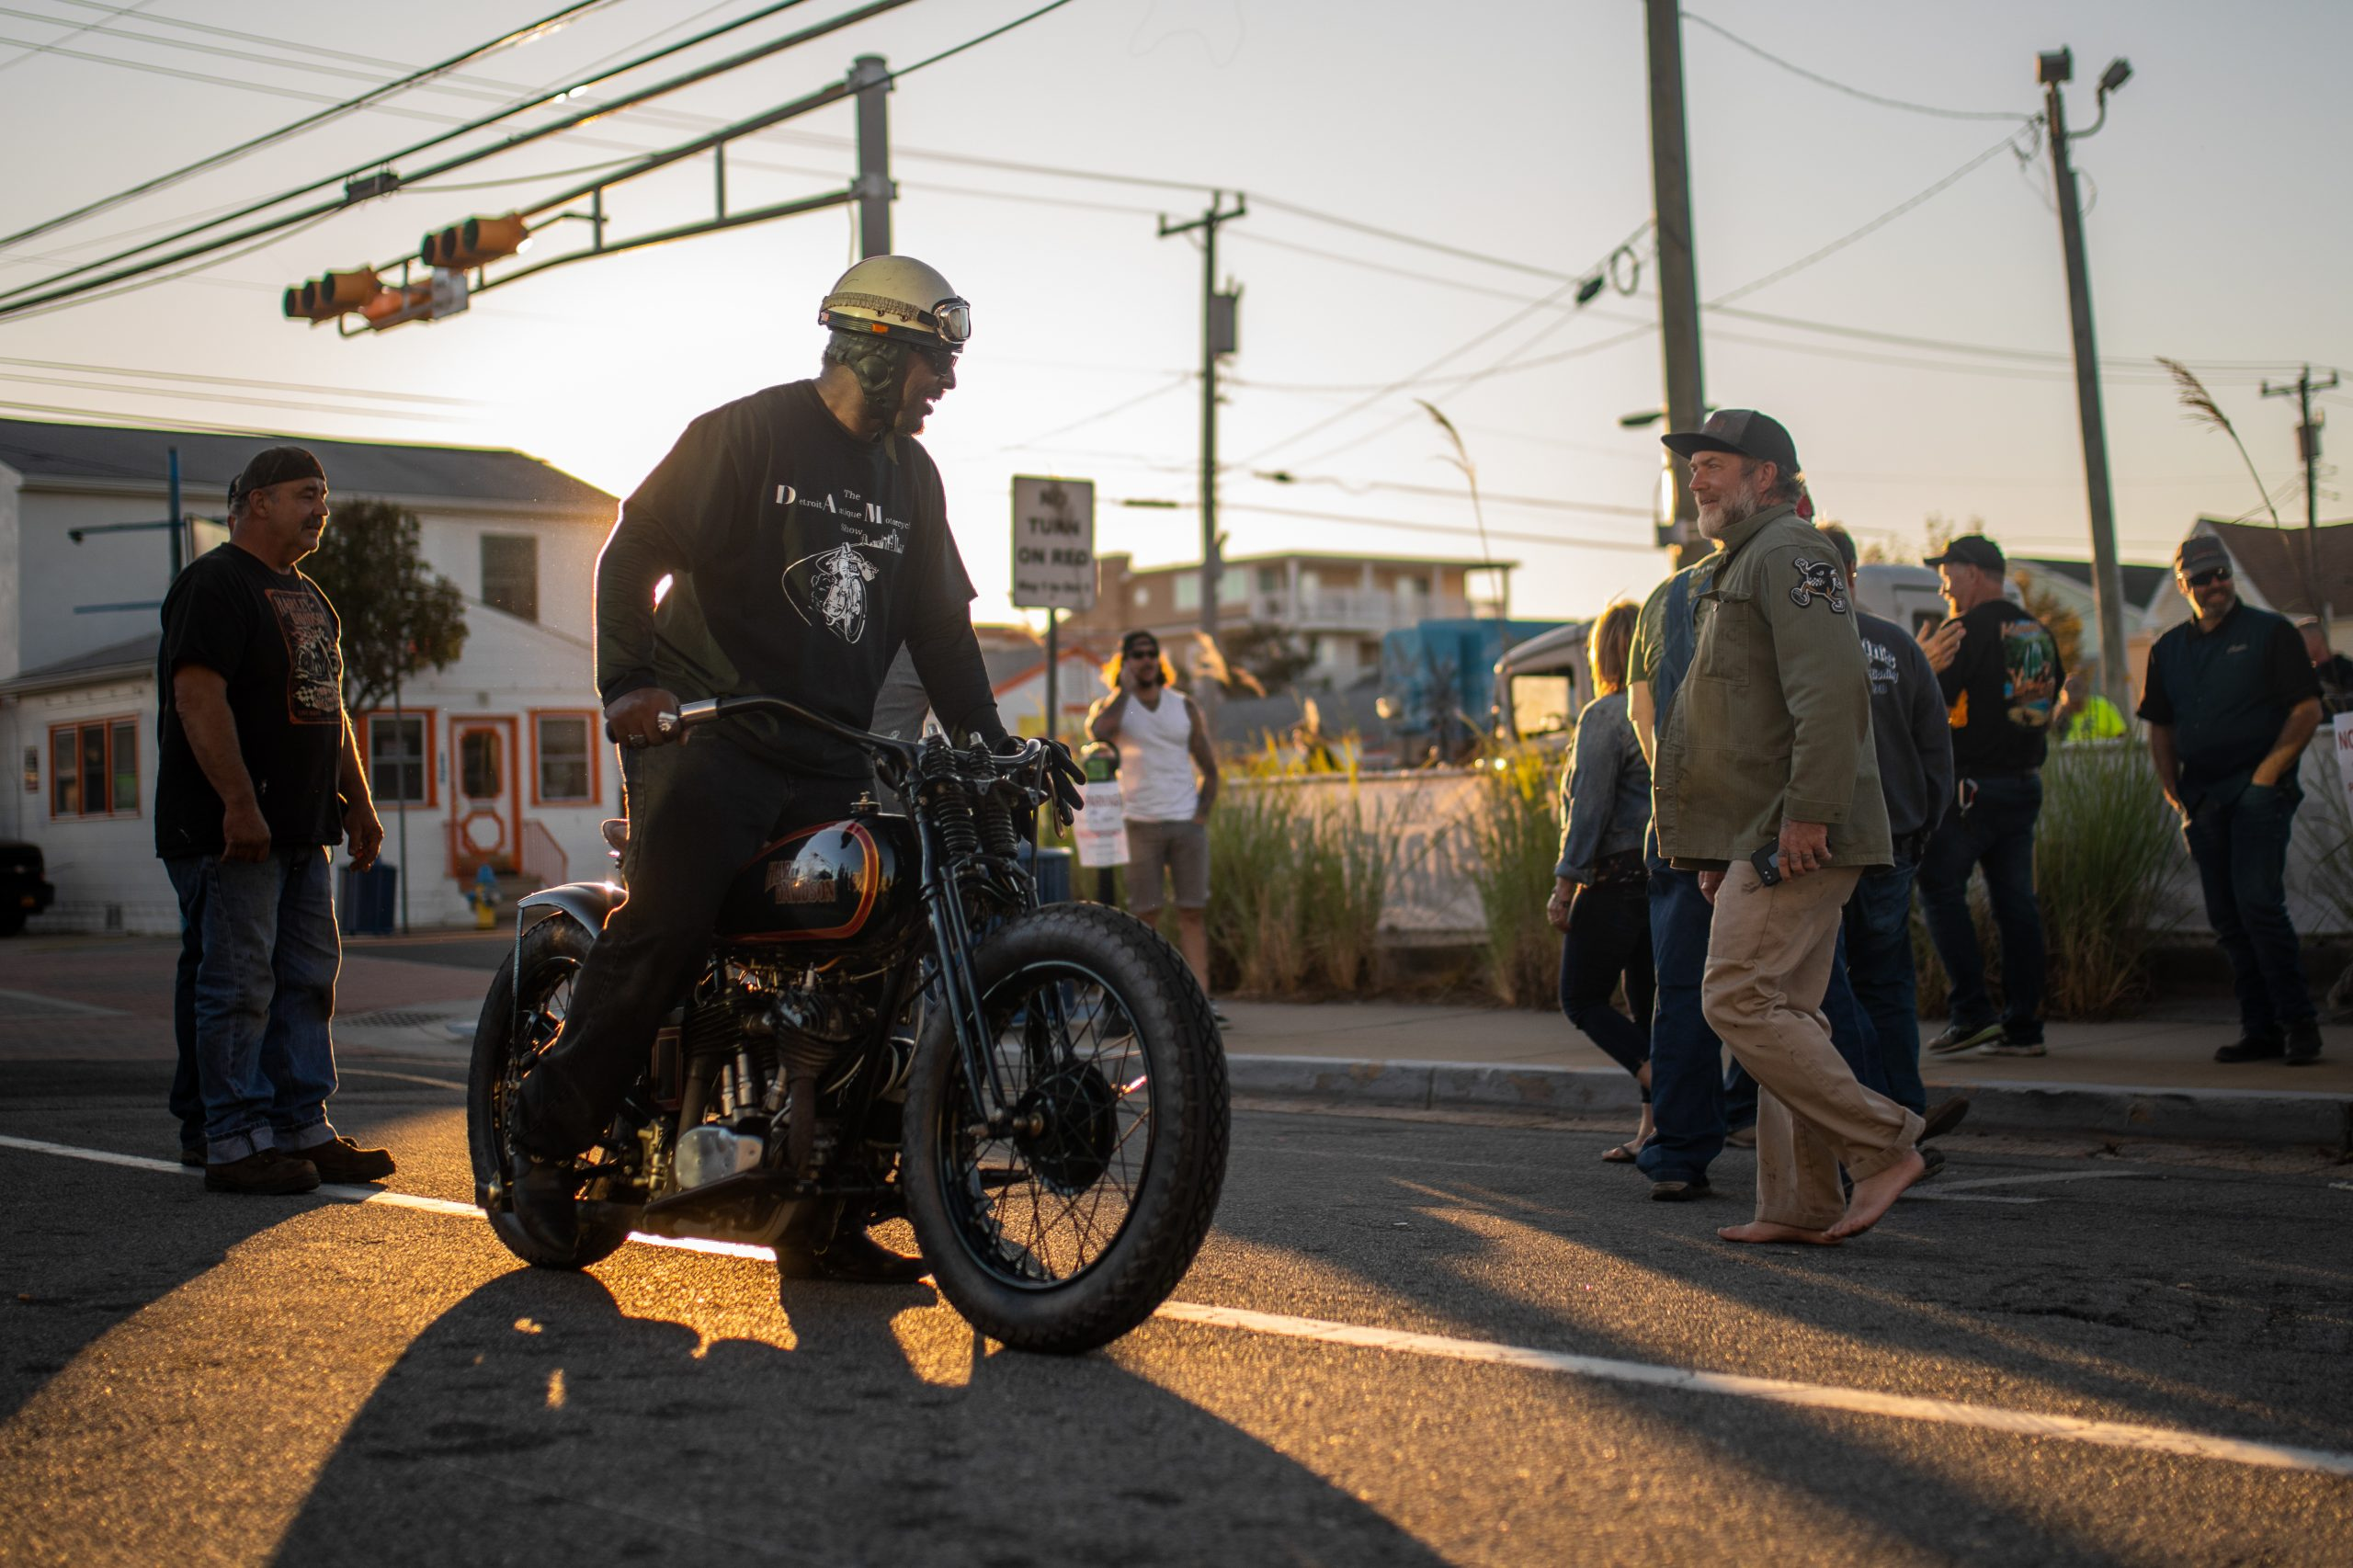 motorbike morning light